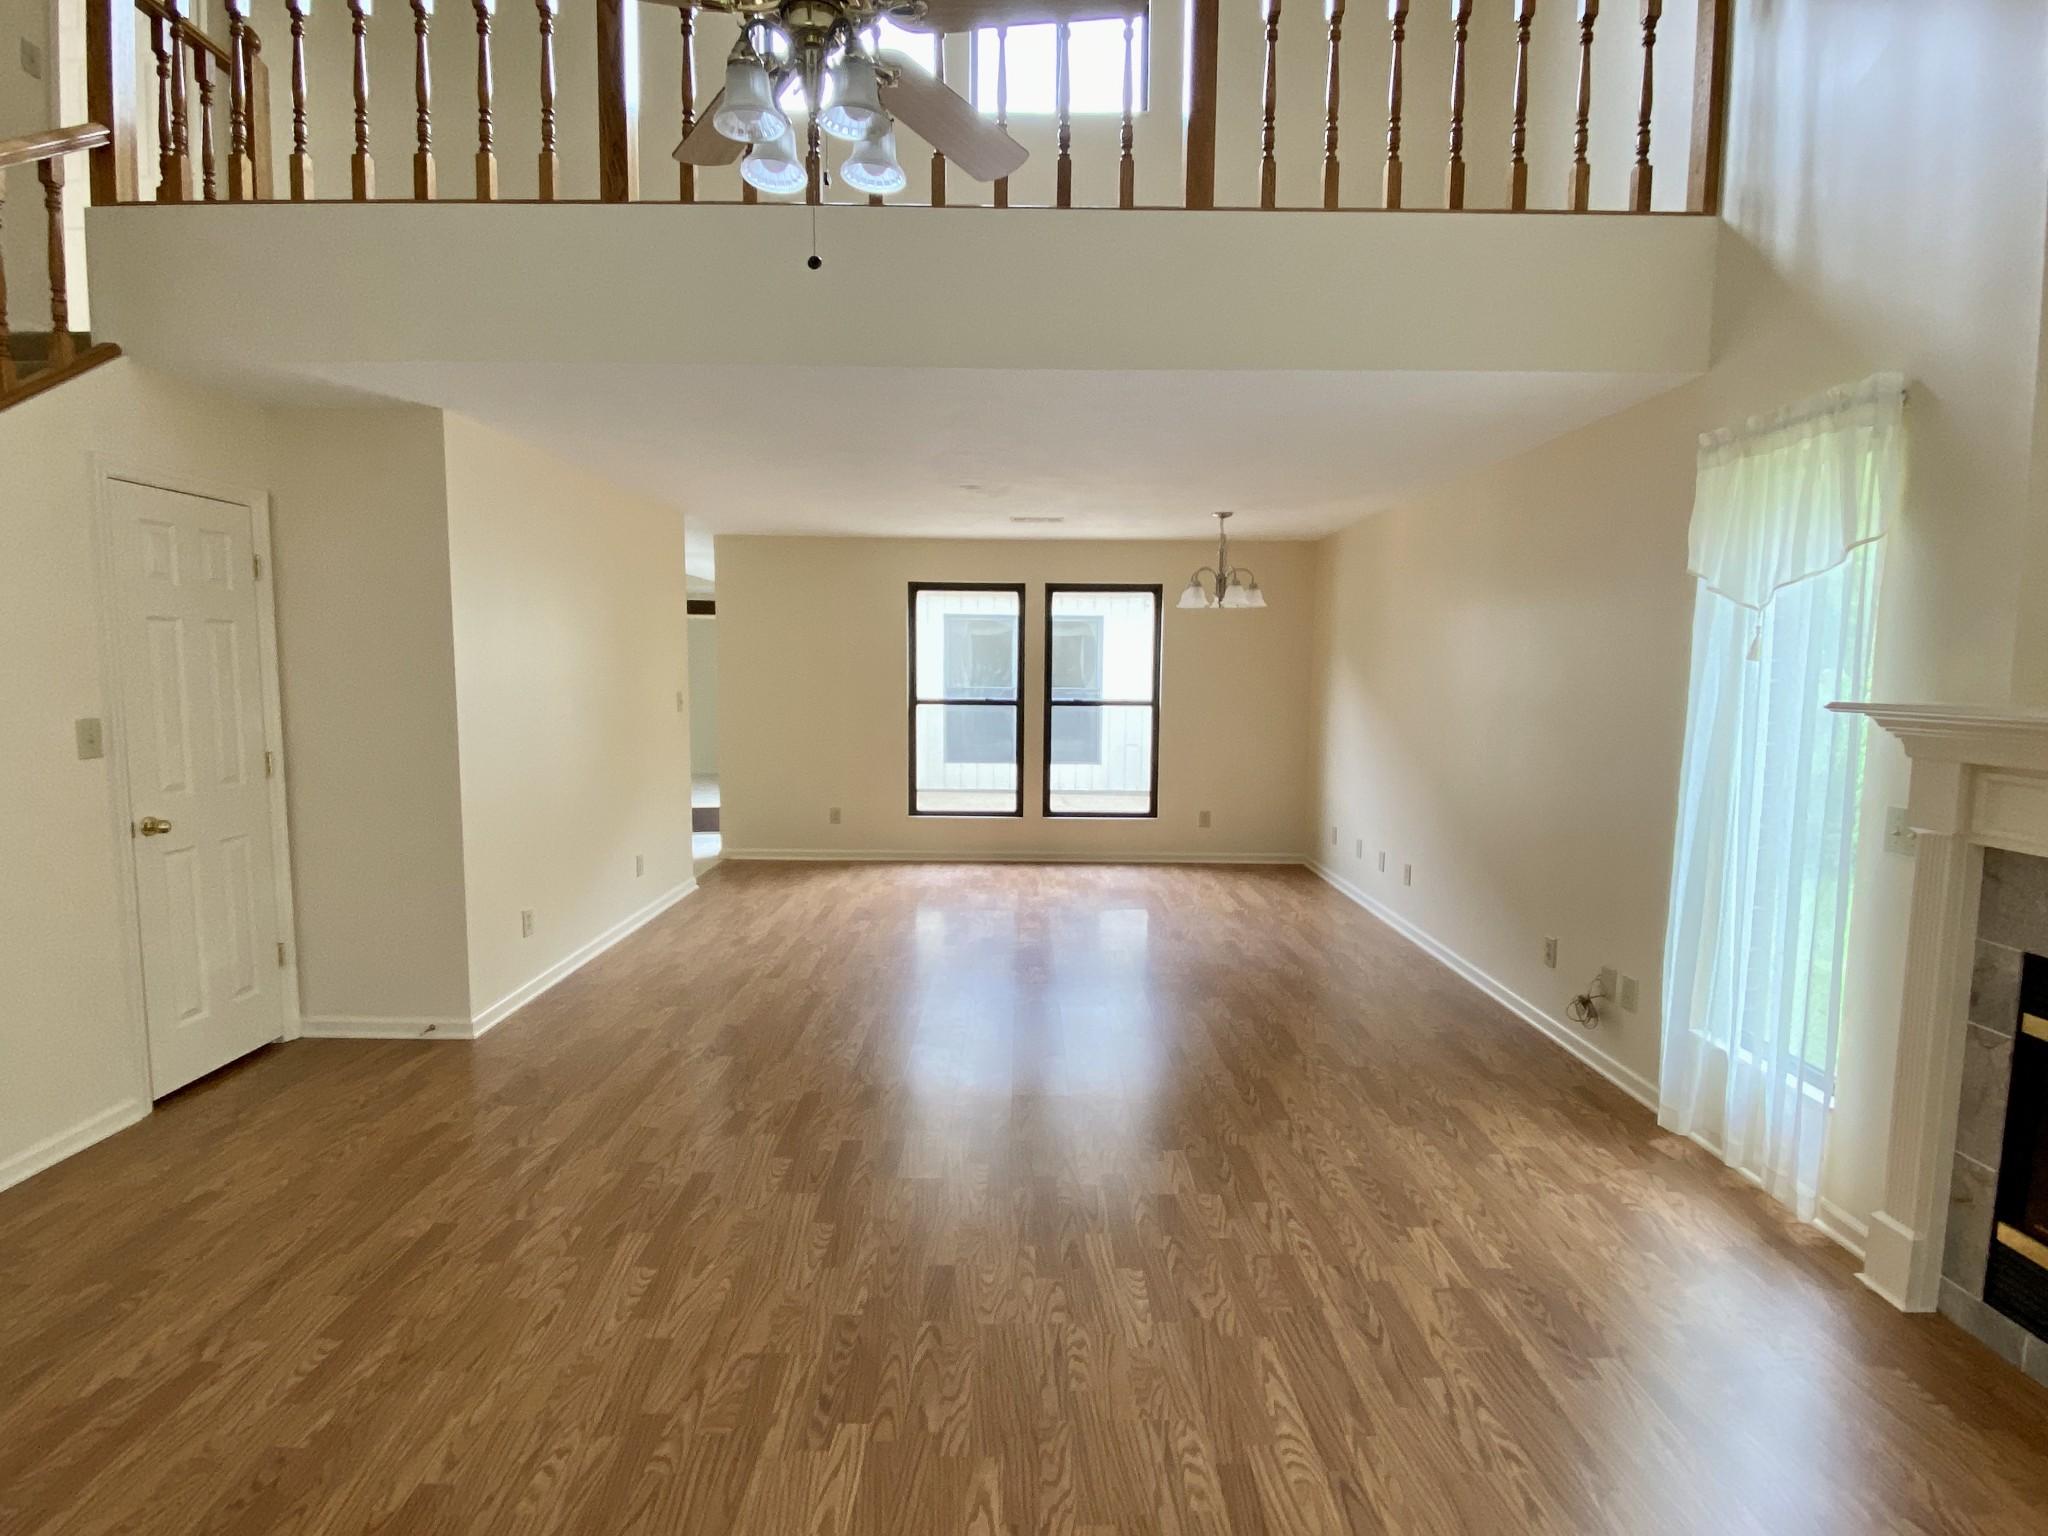 322 Castlewood Ln Property Photo - Lebanon, TN real estate listing